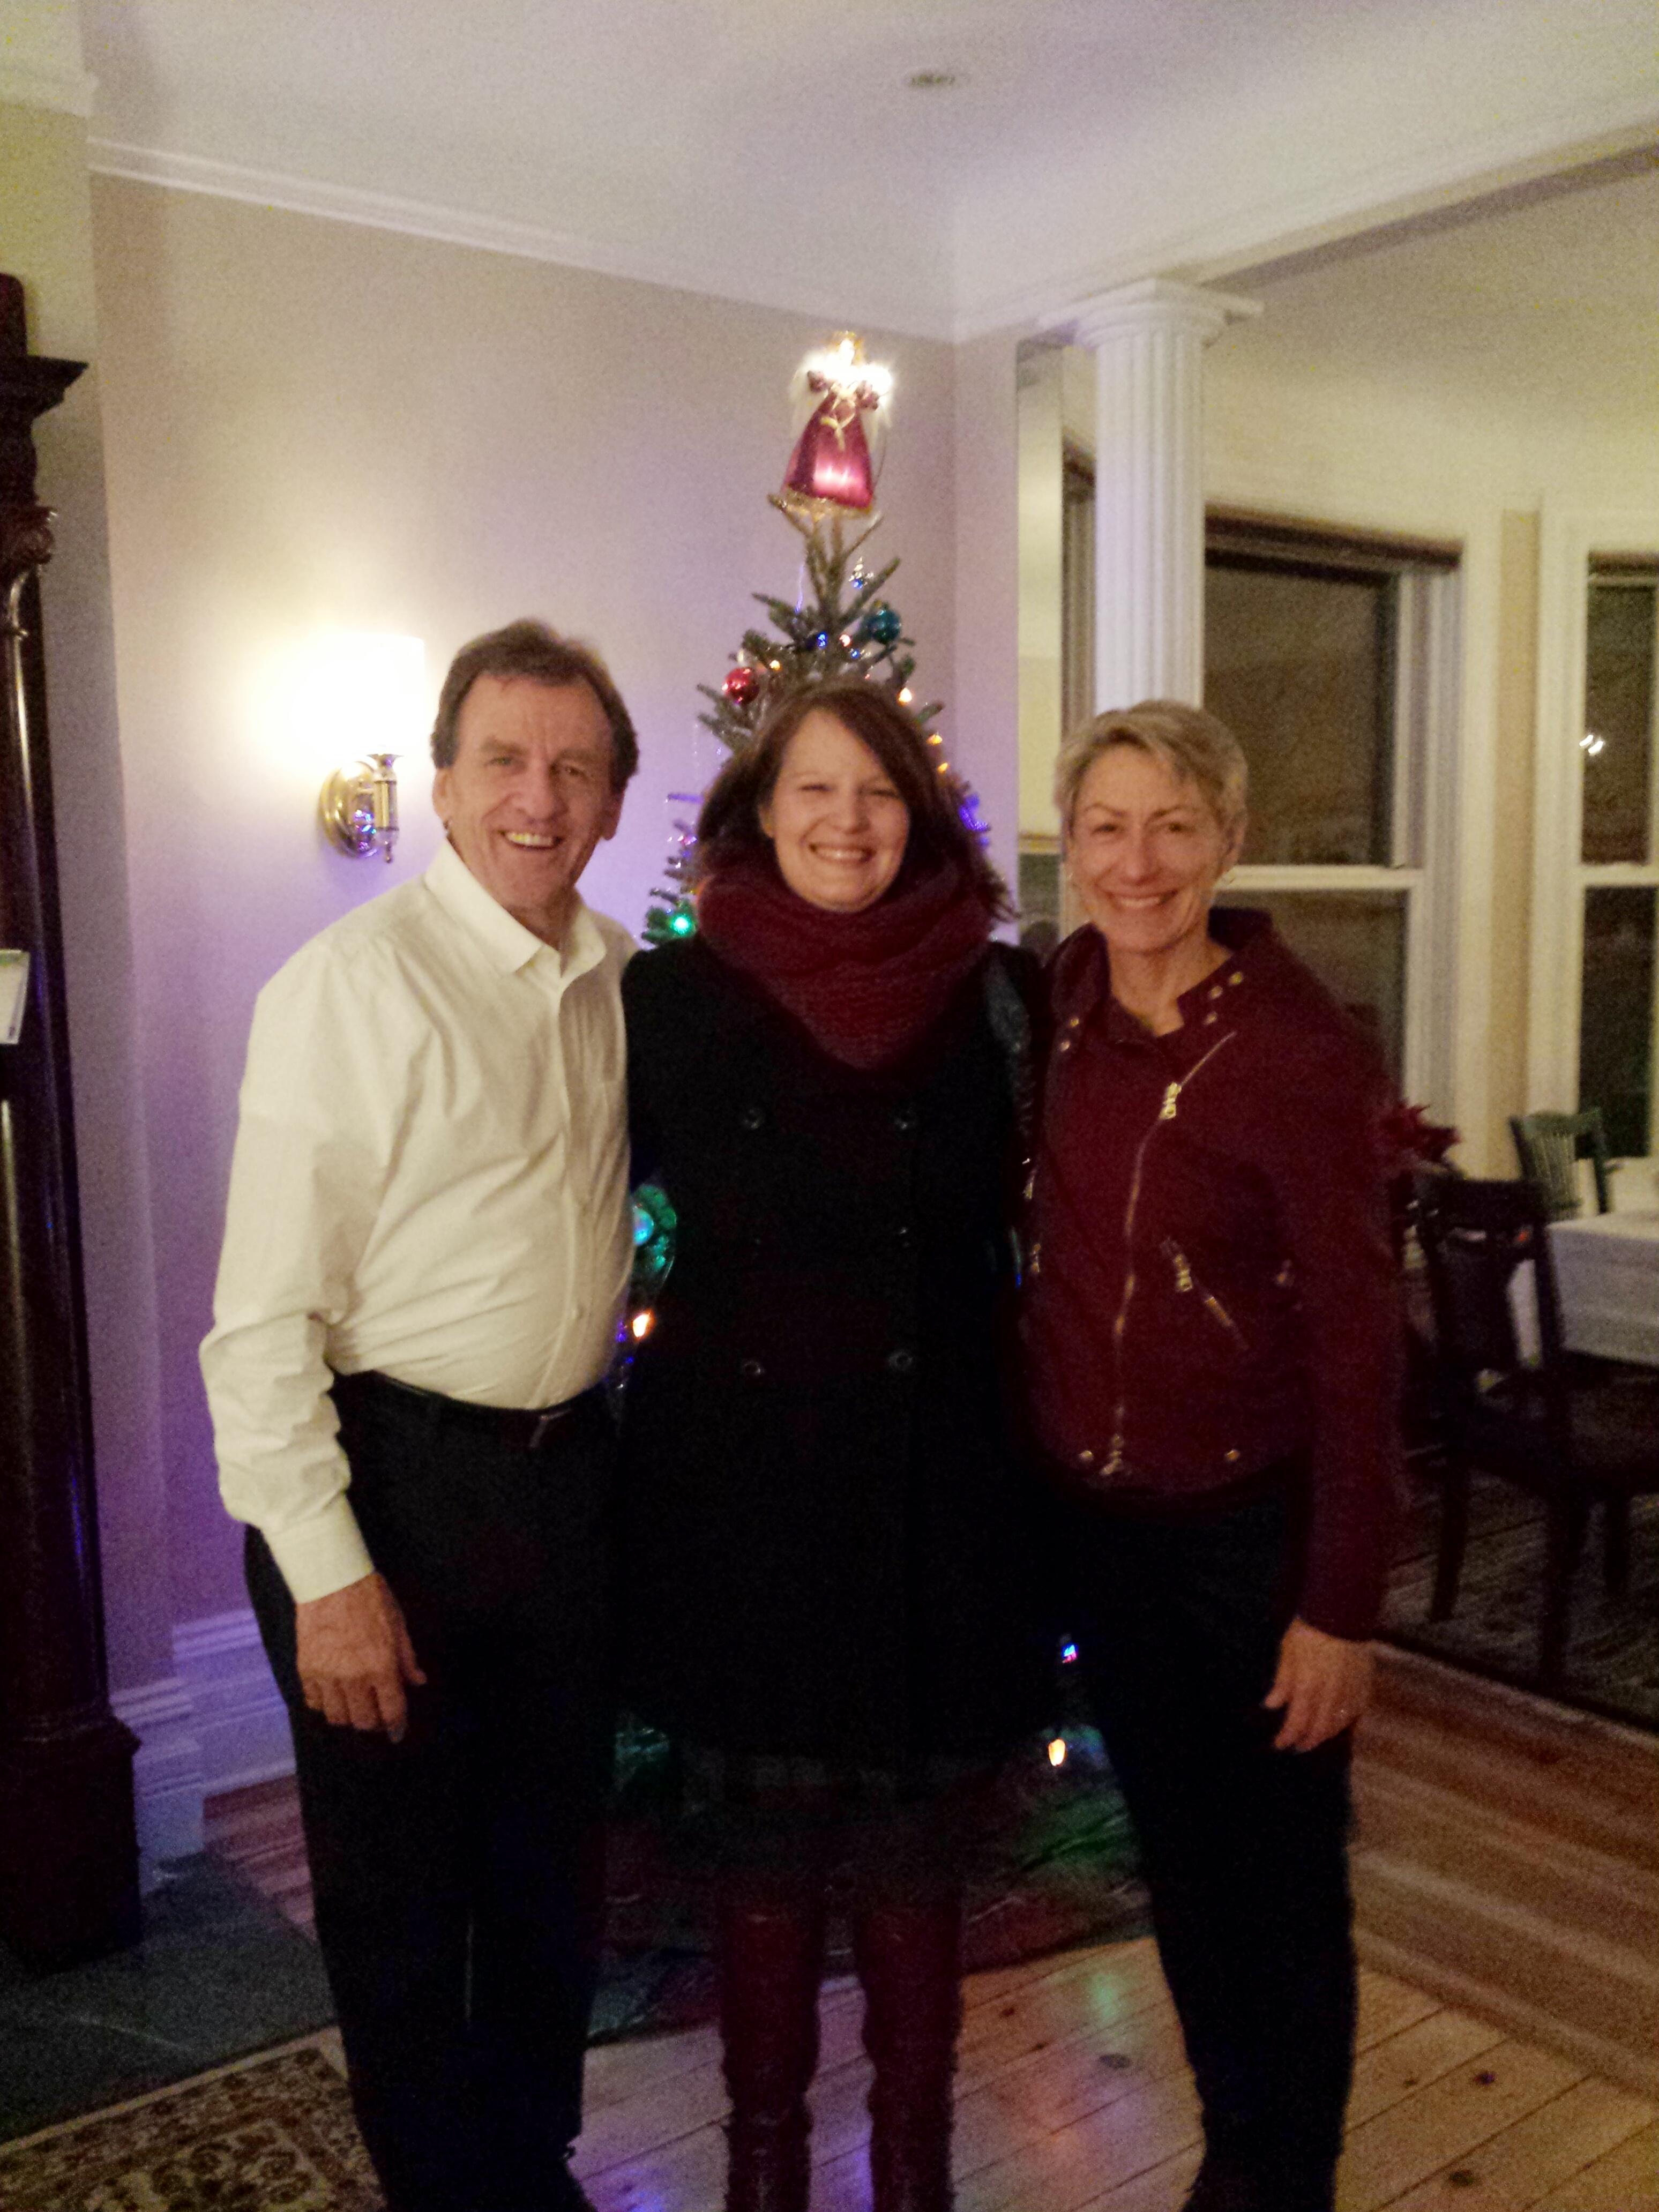 Allan Rock, Deborah Joyce and Debby Rock.